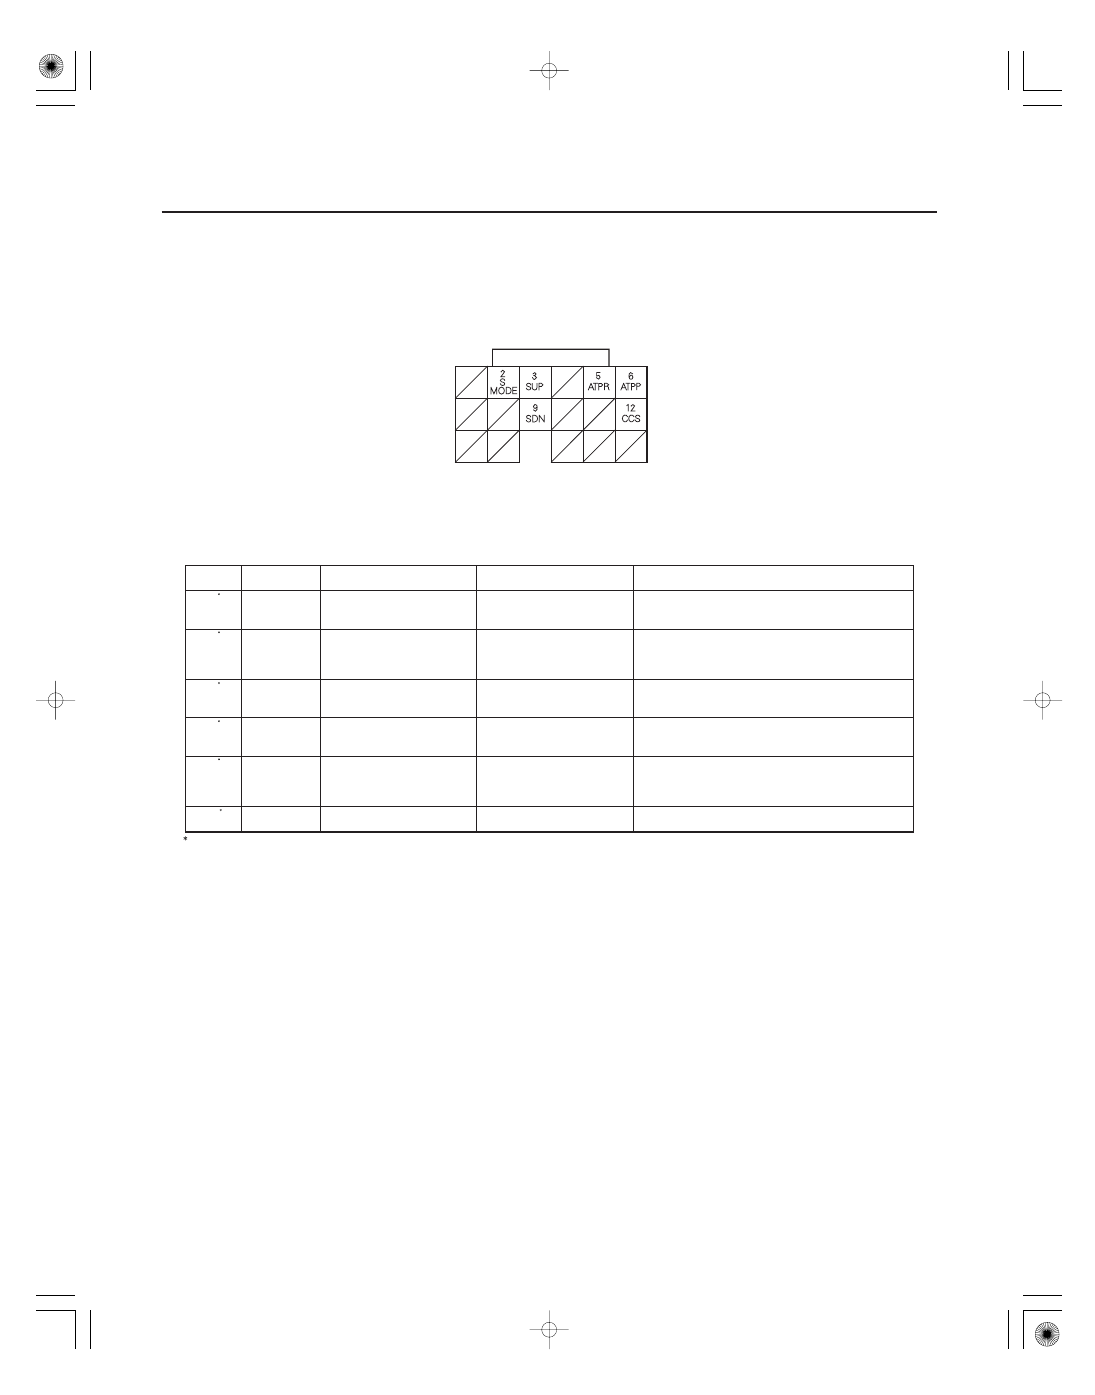 Acura Rsx Honda Integra Manual Part 85 94 Cruise Control Wiring Diagram